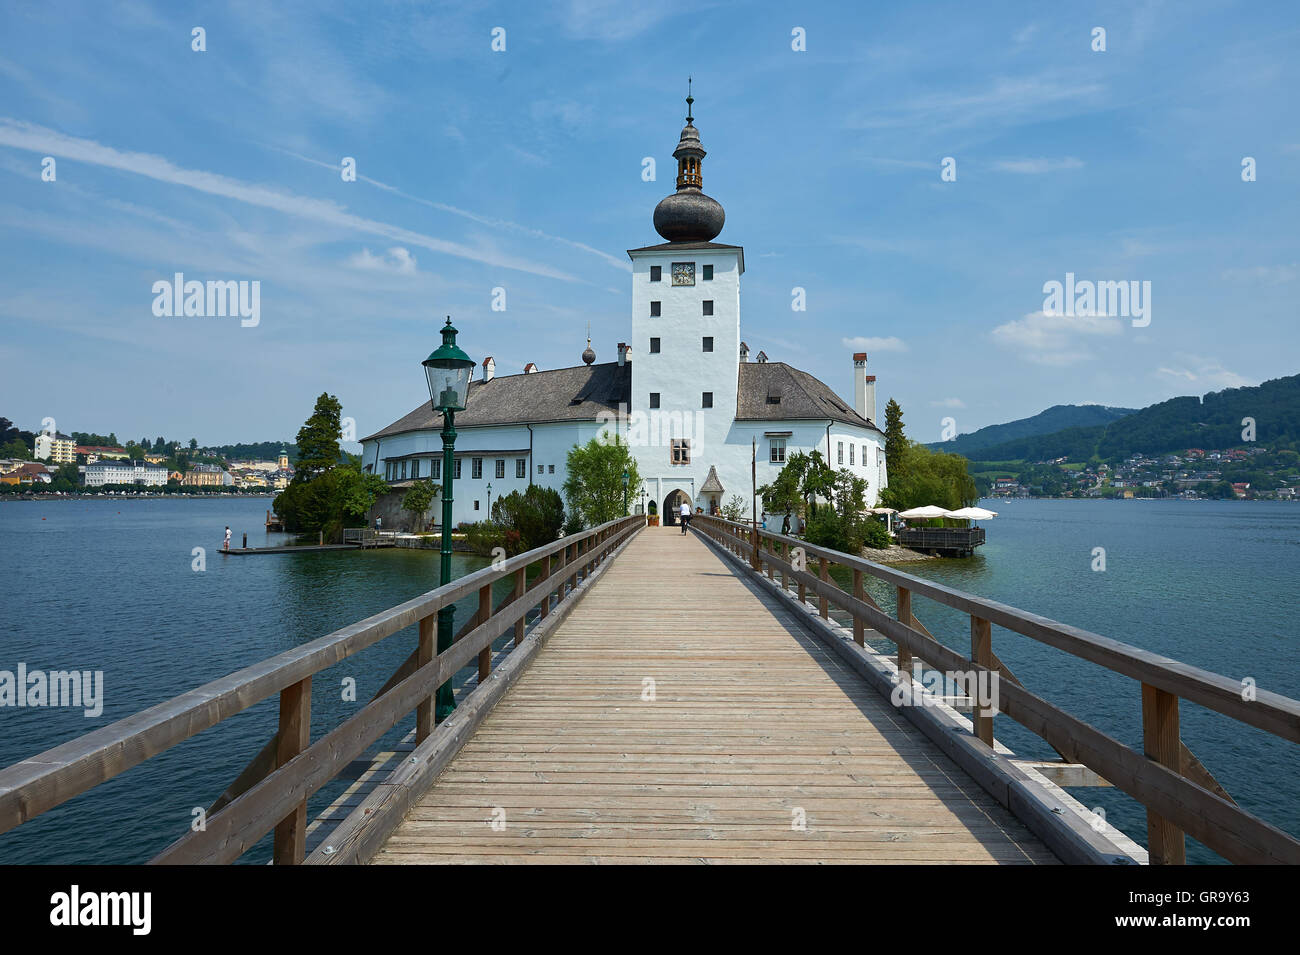 Castle Ort - Stock Image